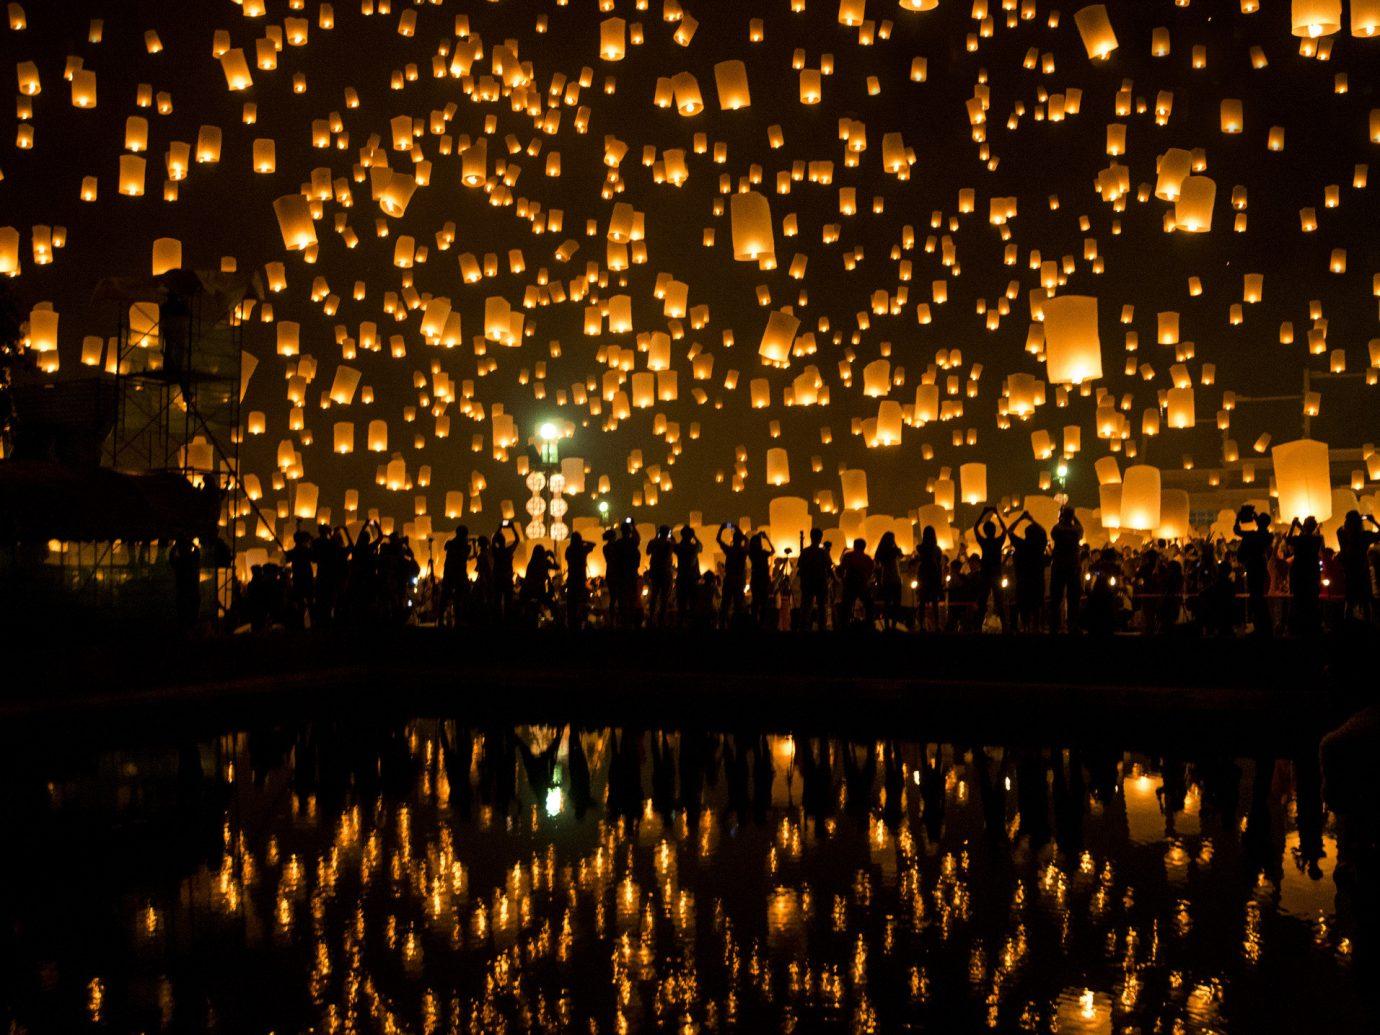 Romance Trip Ideas outdoor water fountain reflection night light darkness evening lighting City